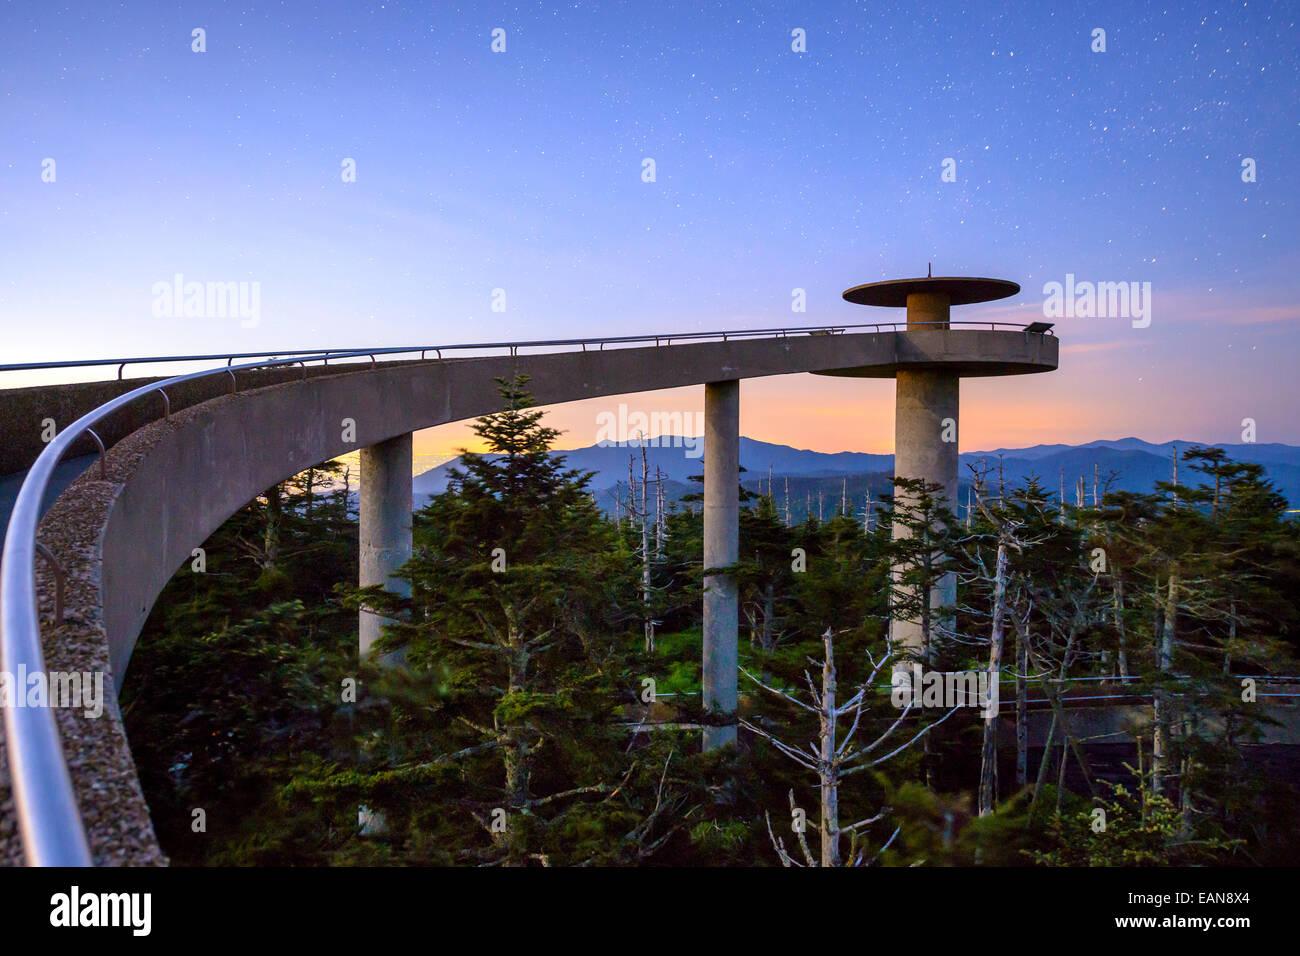 Clingman der Kuppel Berggipfel Observatorium in den Great Smoky Mountains, Tennessee, USA. Stockbild